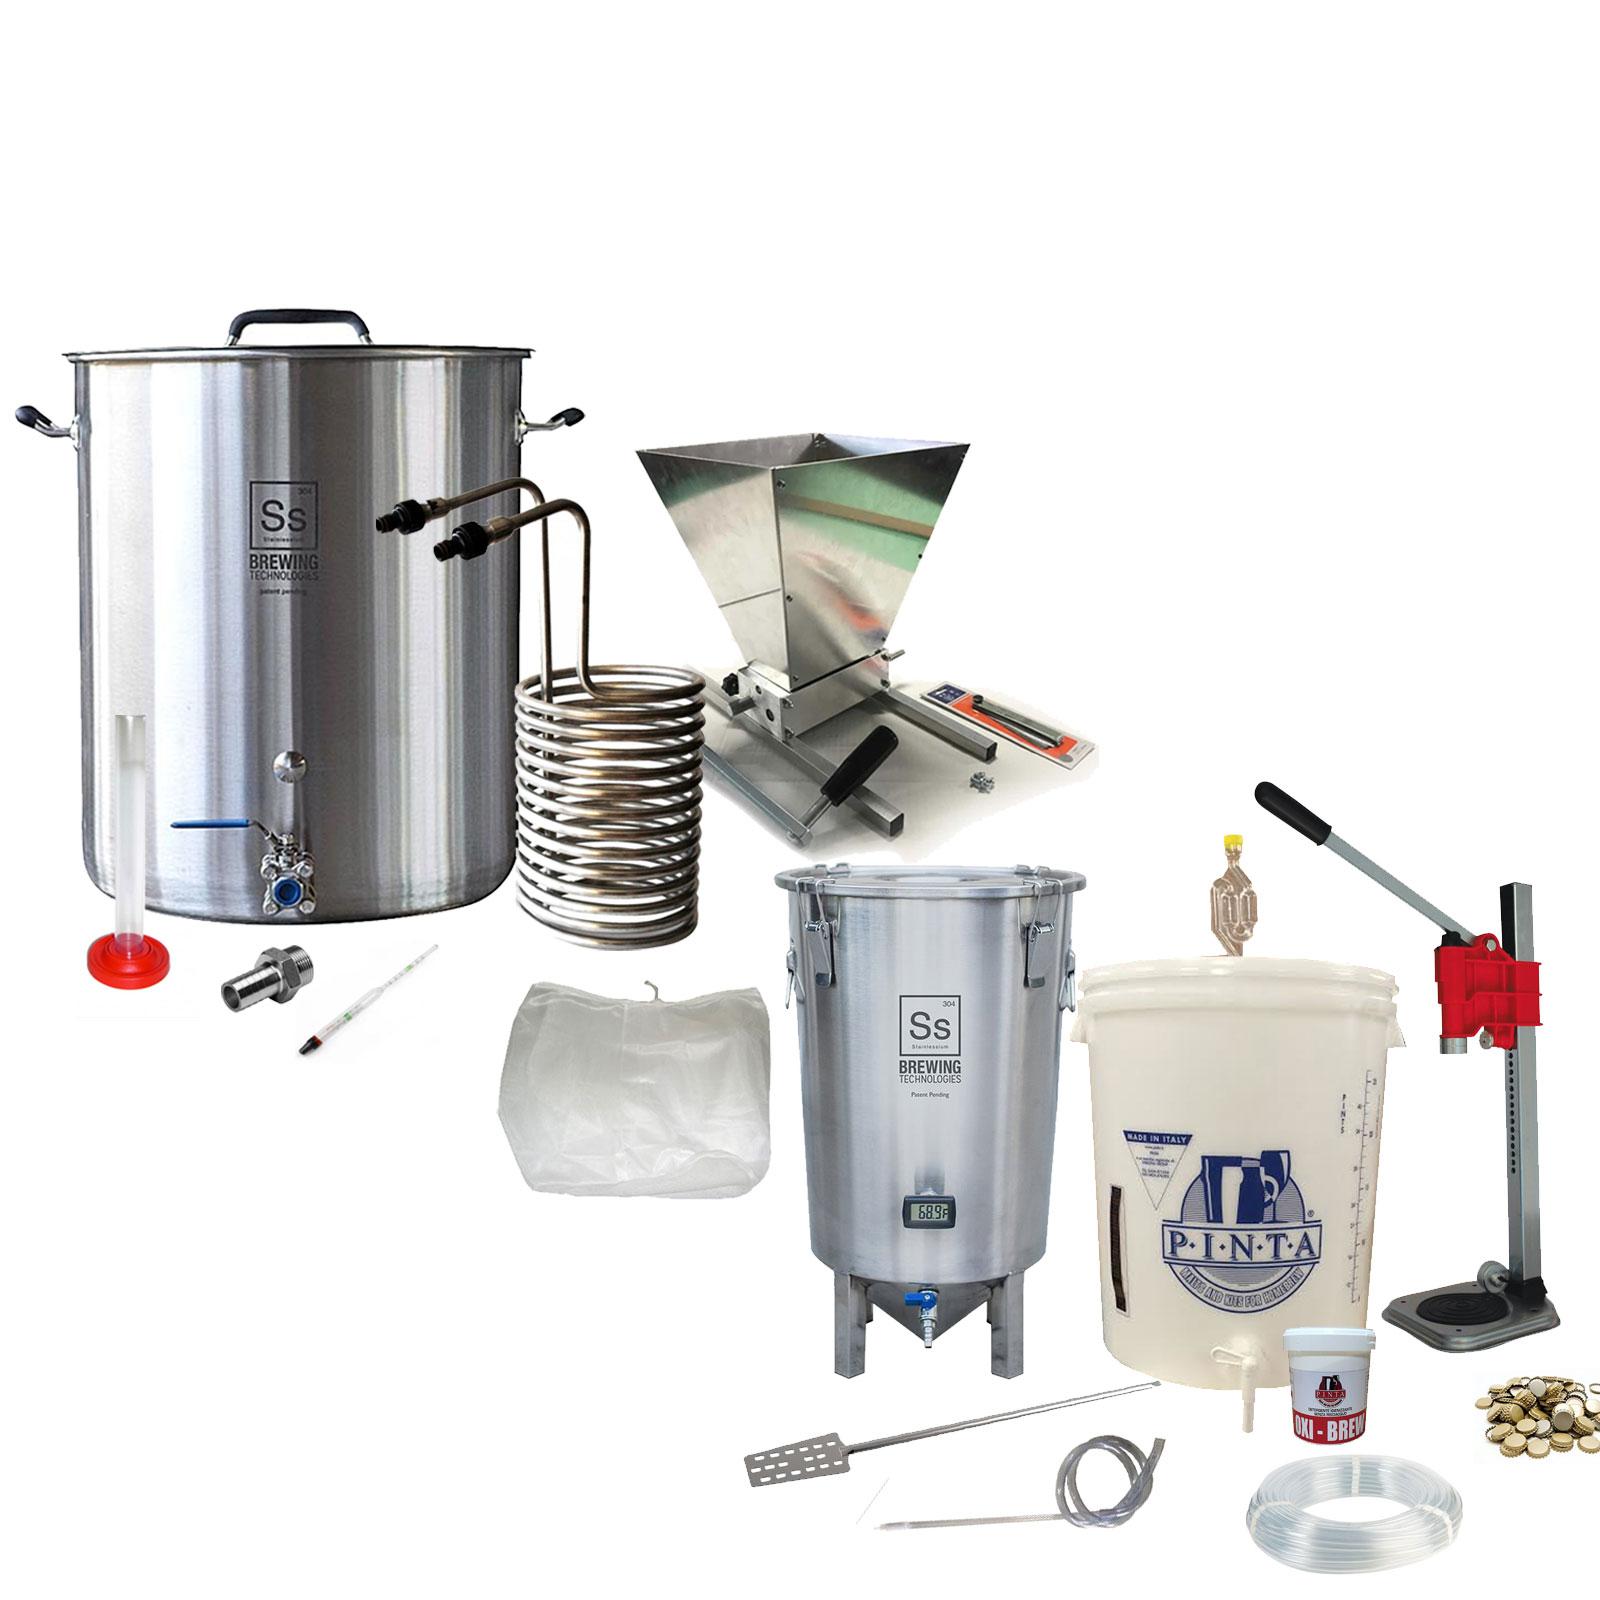 Kit produzione birra all grain Professional Pinta